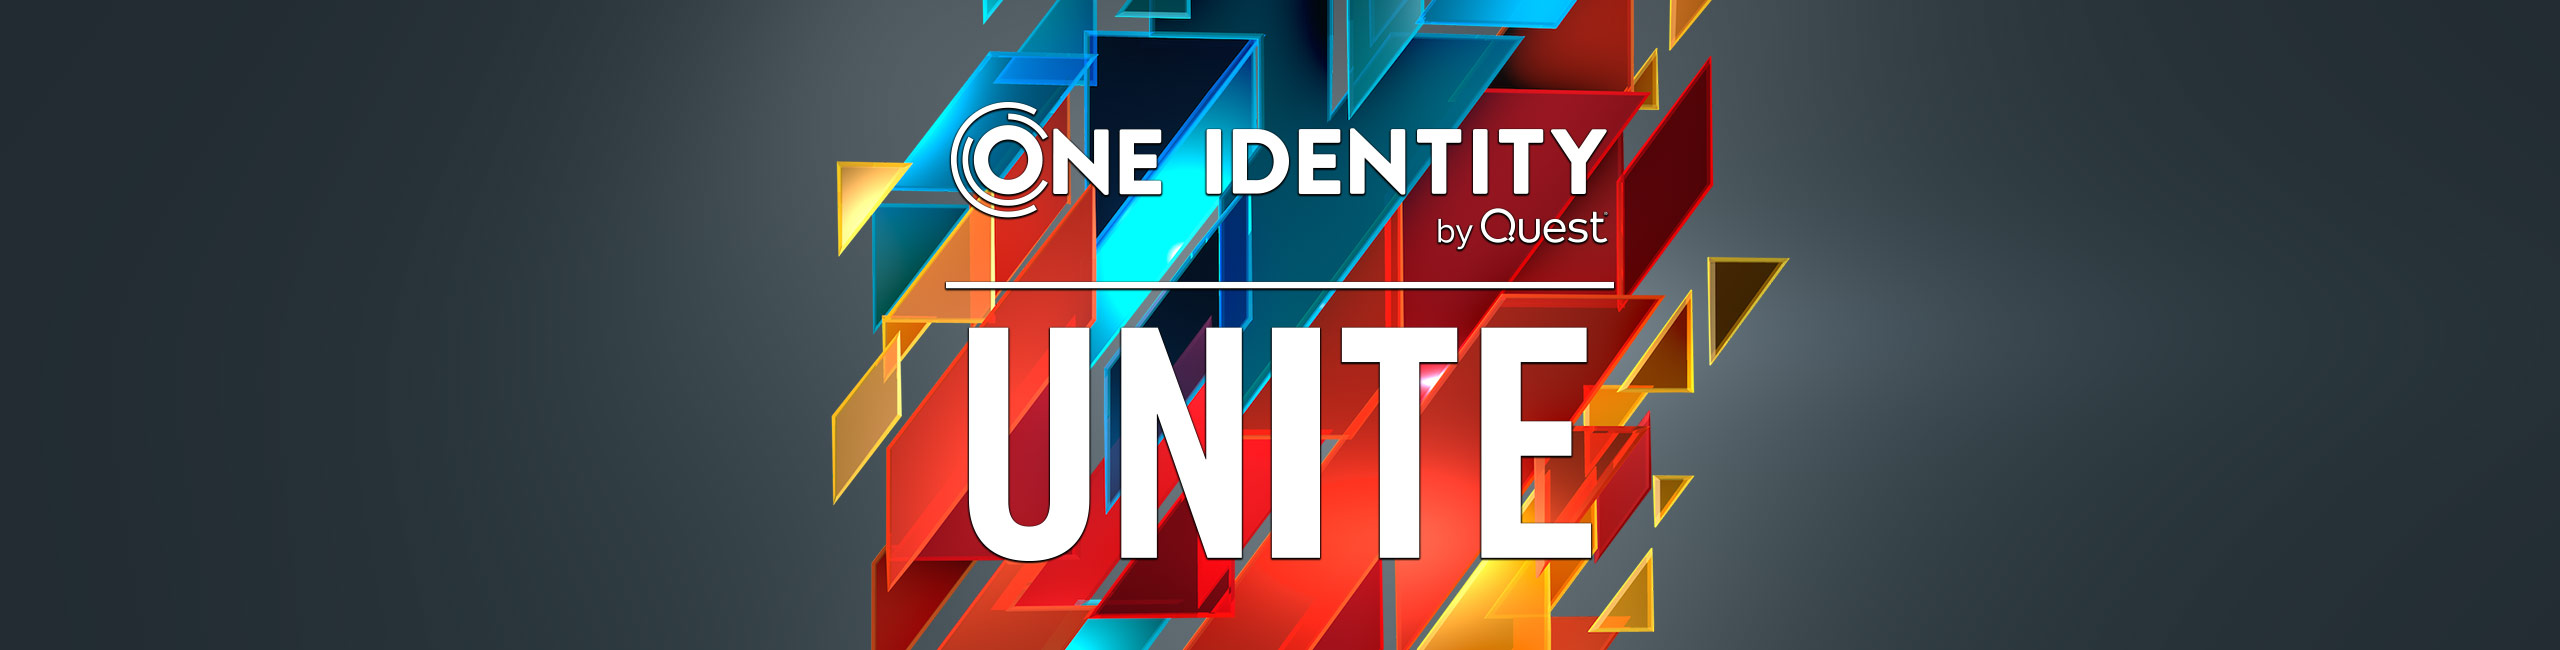 One Identity UNITE - Barcelona, Spain 2020